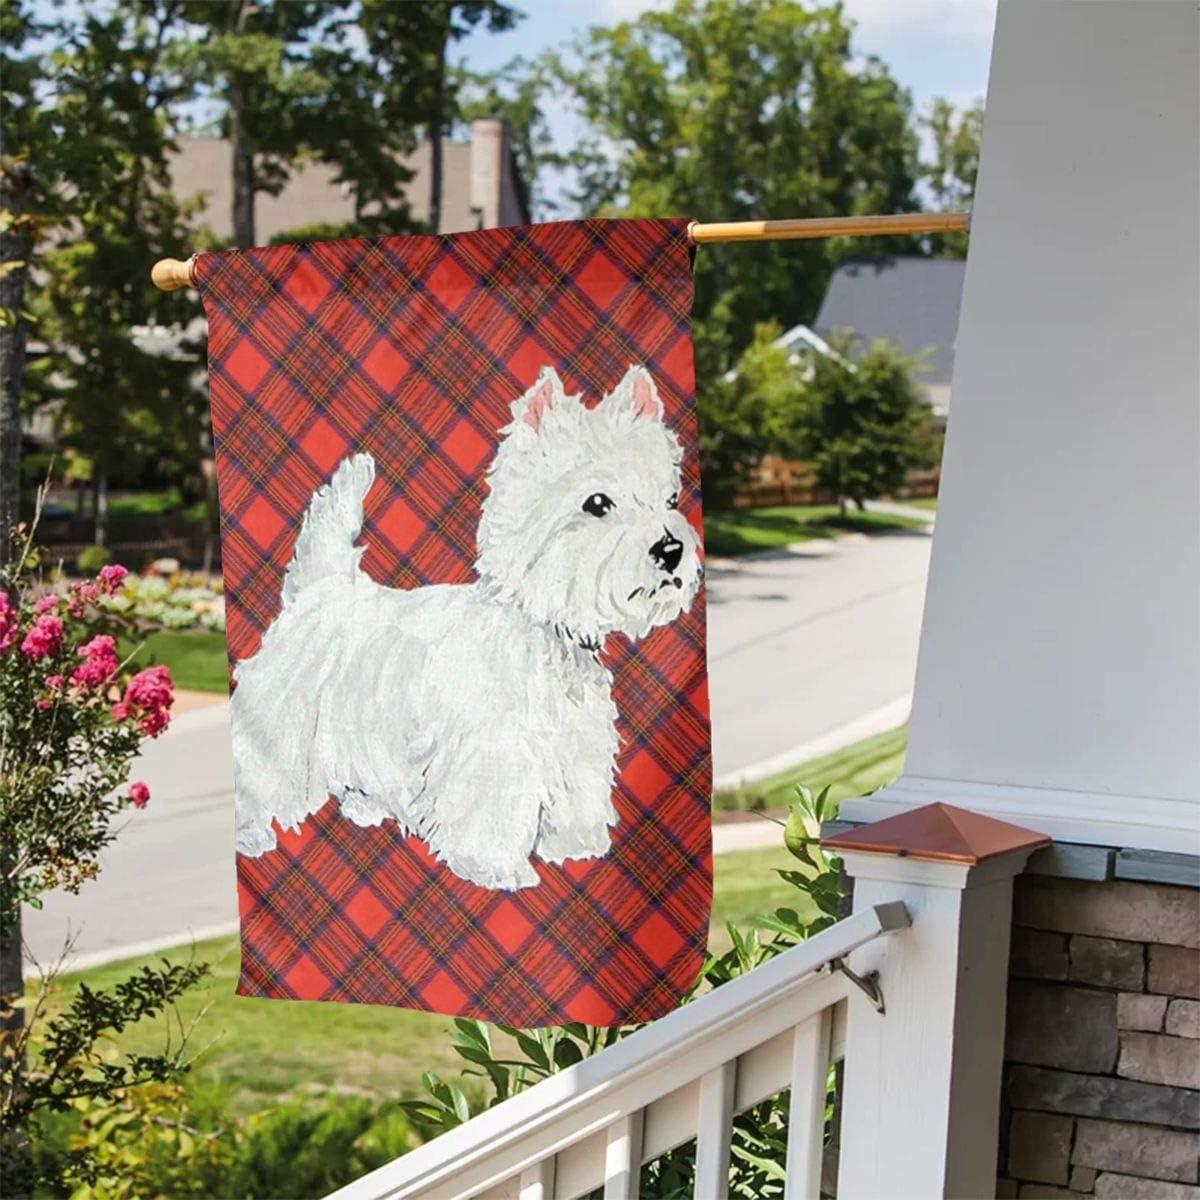 Customized Beautiful Pattern for Decorating Courtyards Etc. in Gardens Grebsw Tartan West Highland White Terrier Garden Flag 12 /× 18